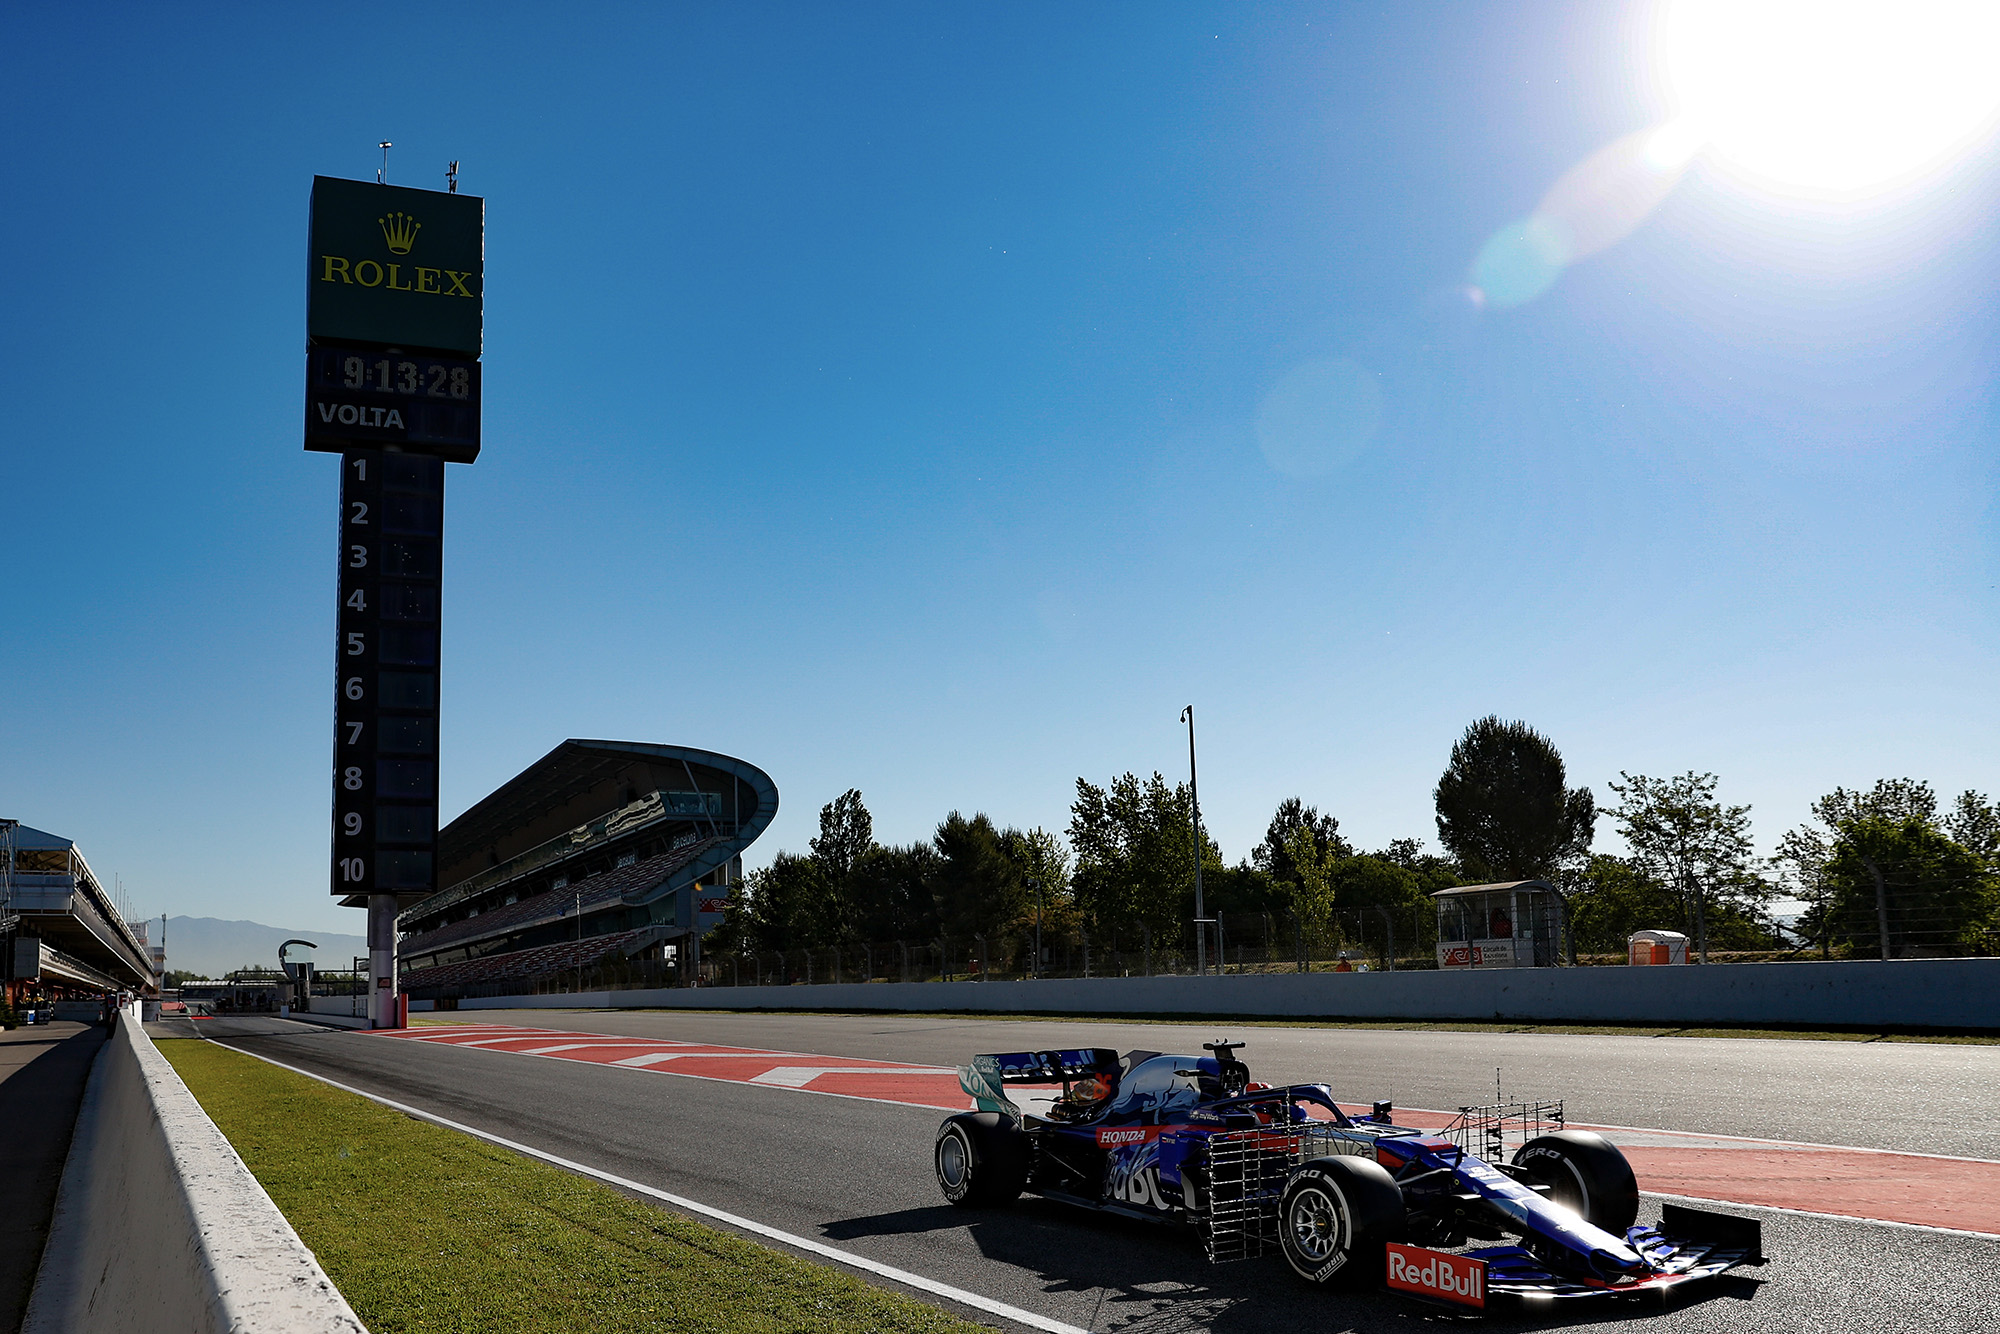 Toro Rosso pre-season testing